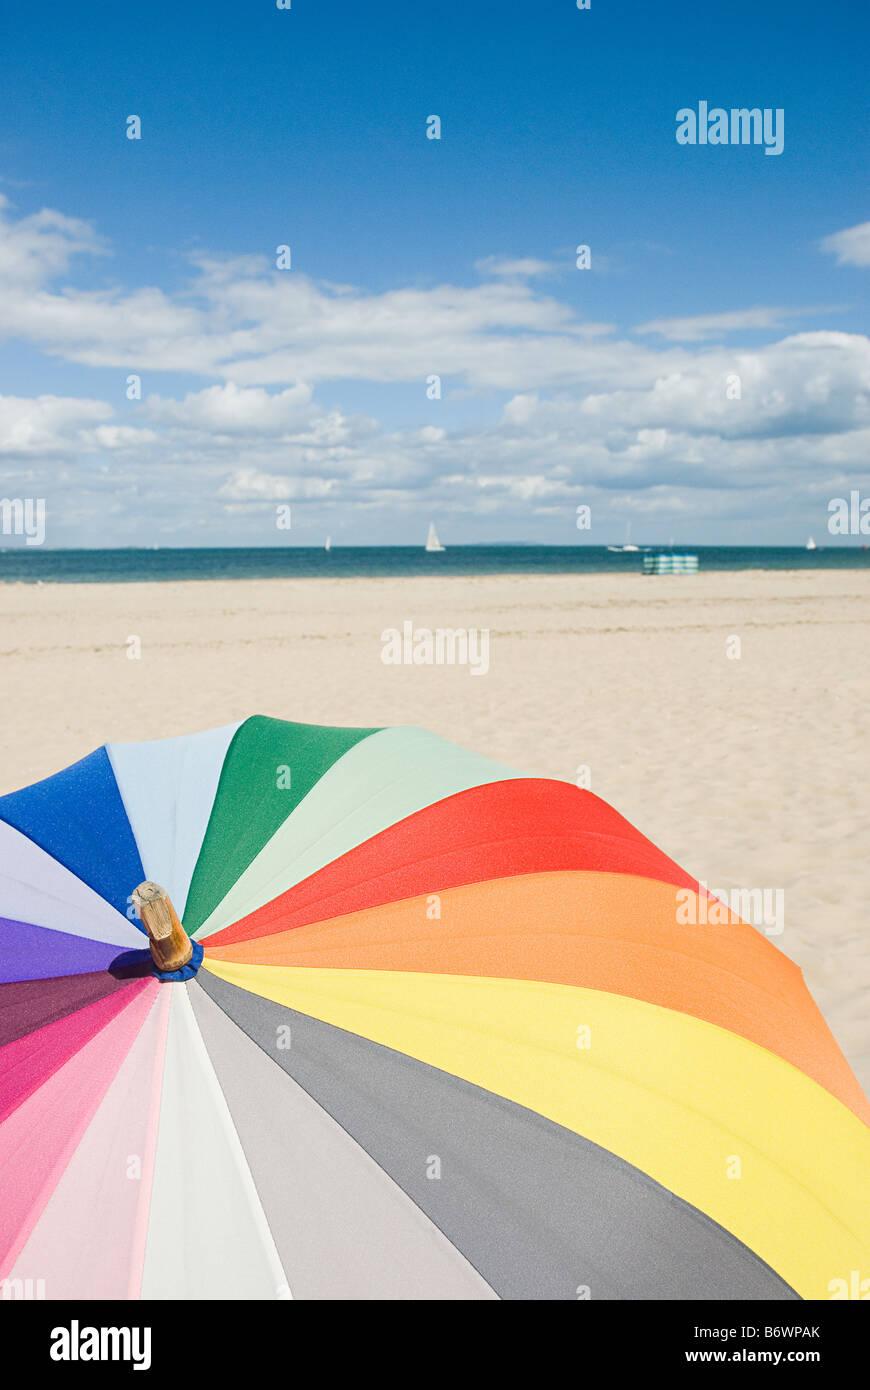 Umbrella on beach - Stock Image